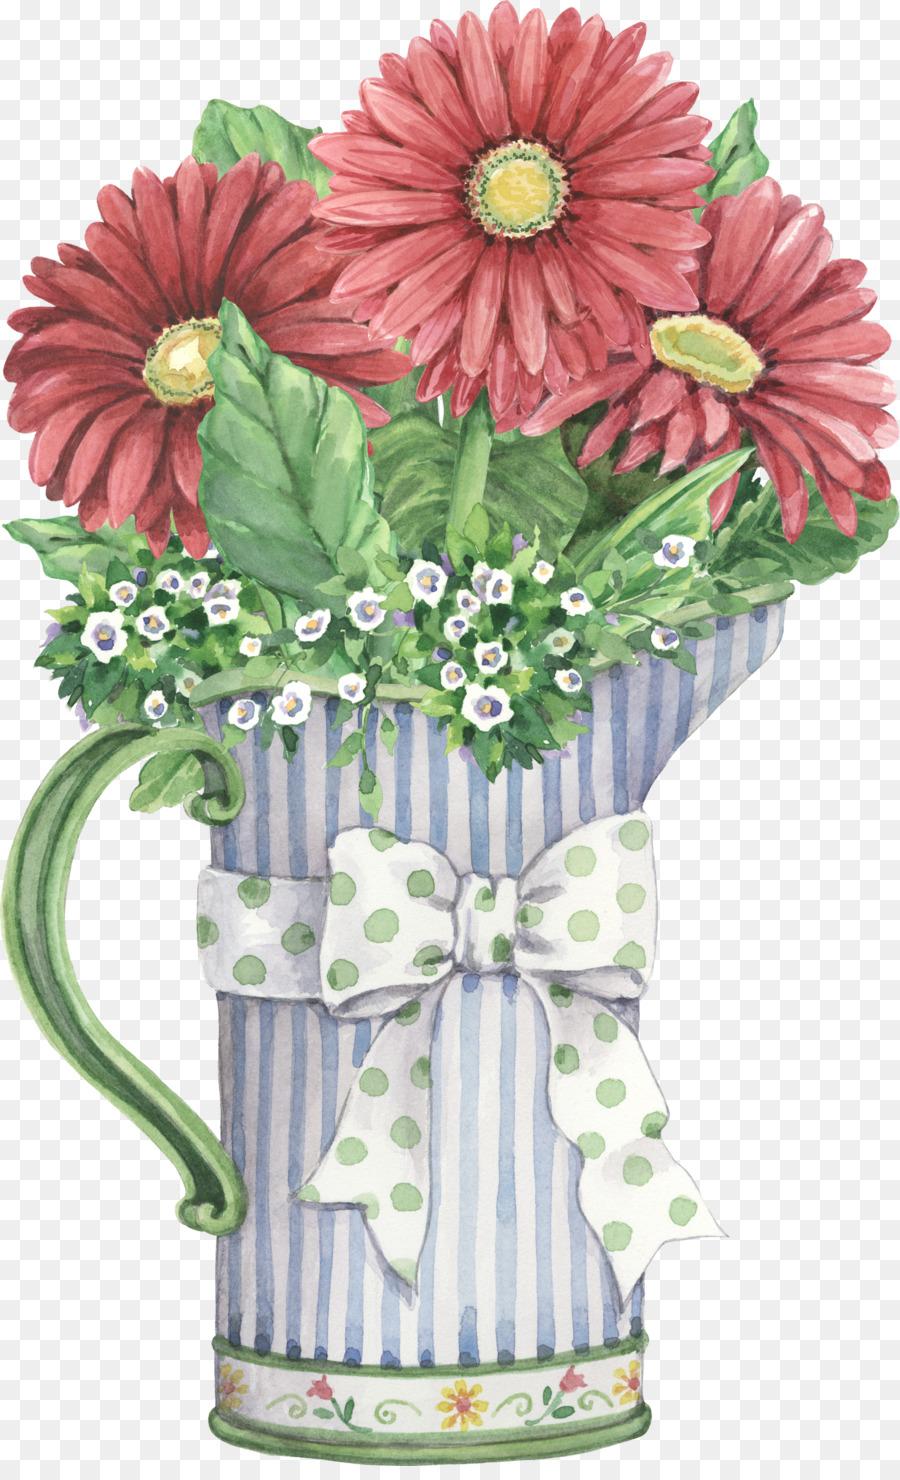 Flower Vase Painting Clip art - bouquet of flowers png ...